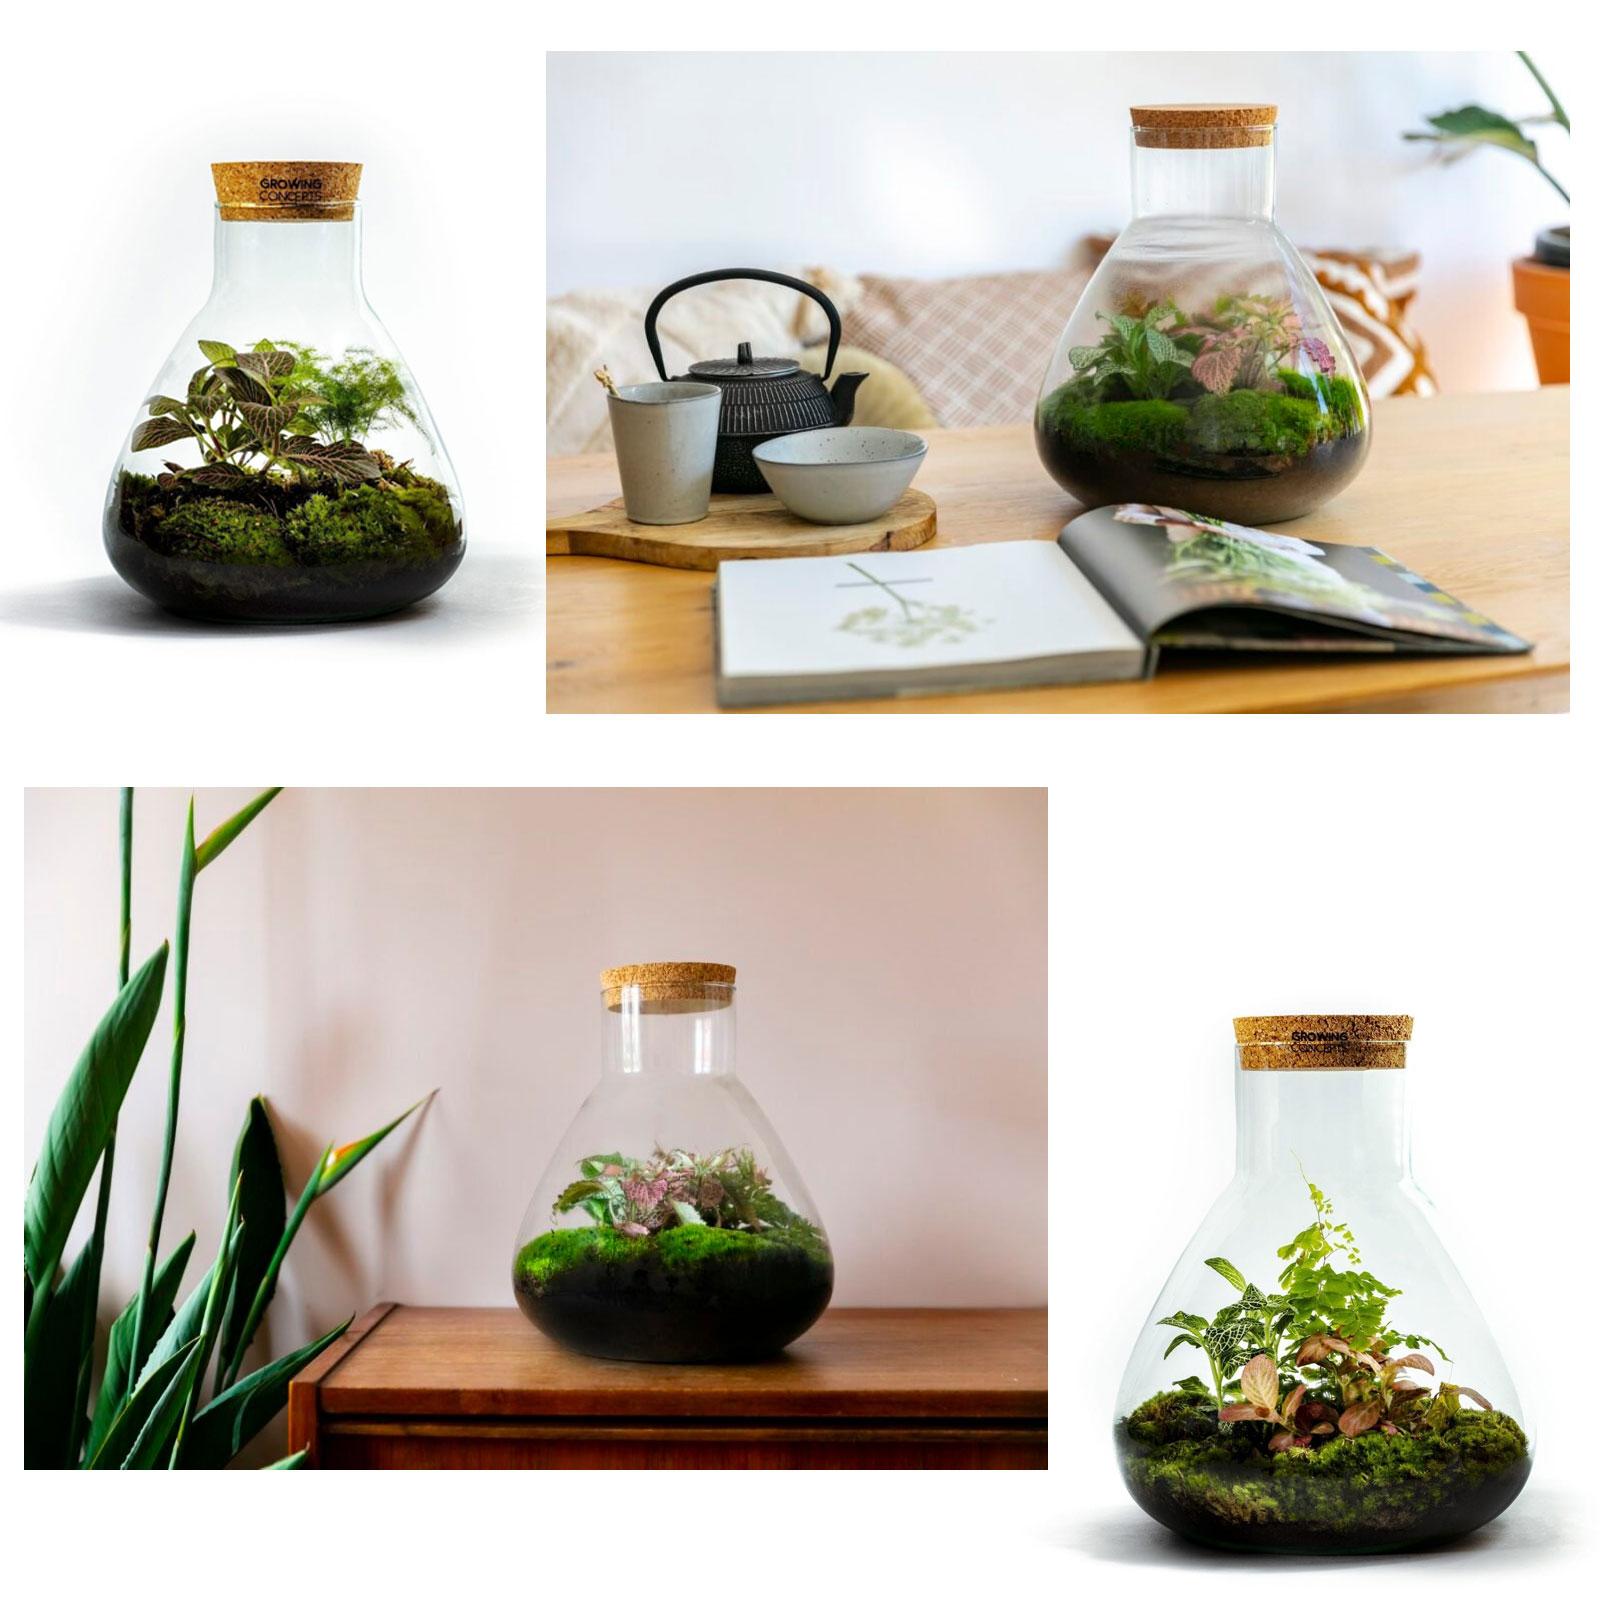 30% Korting op div formaten terraria @ Growing Concepts